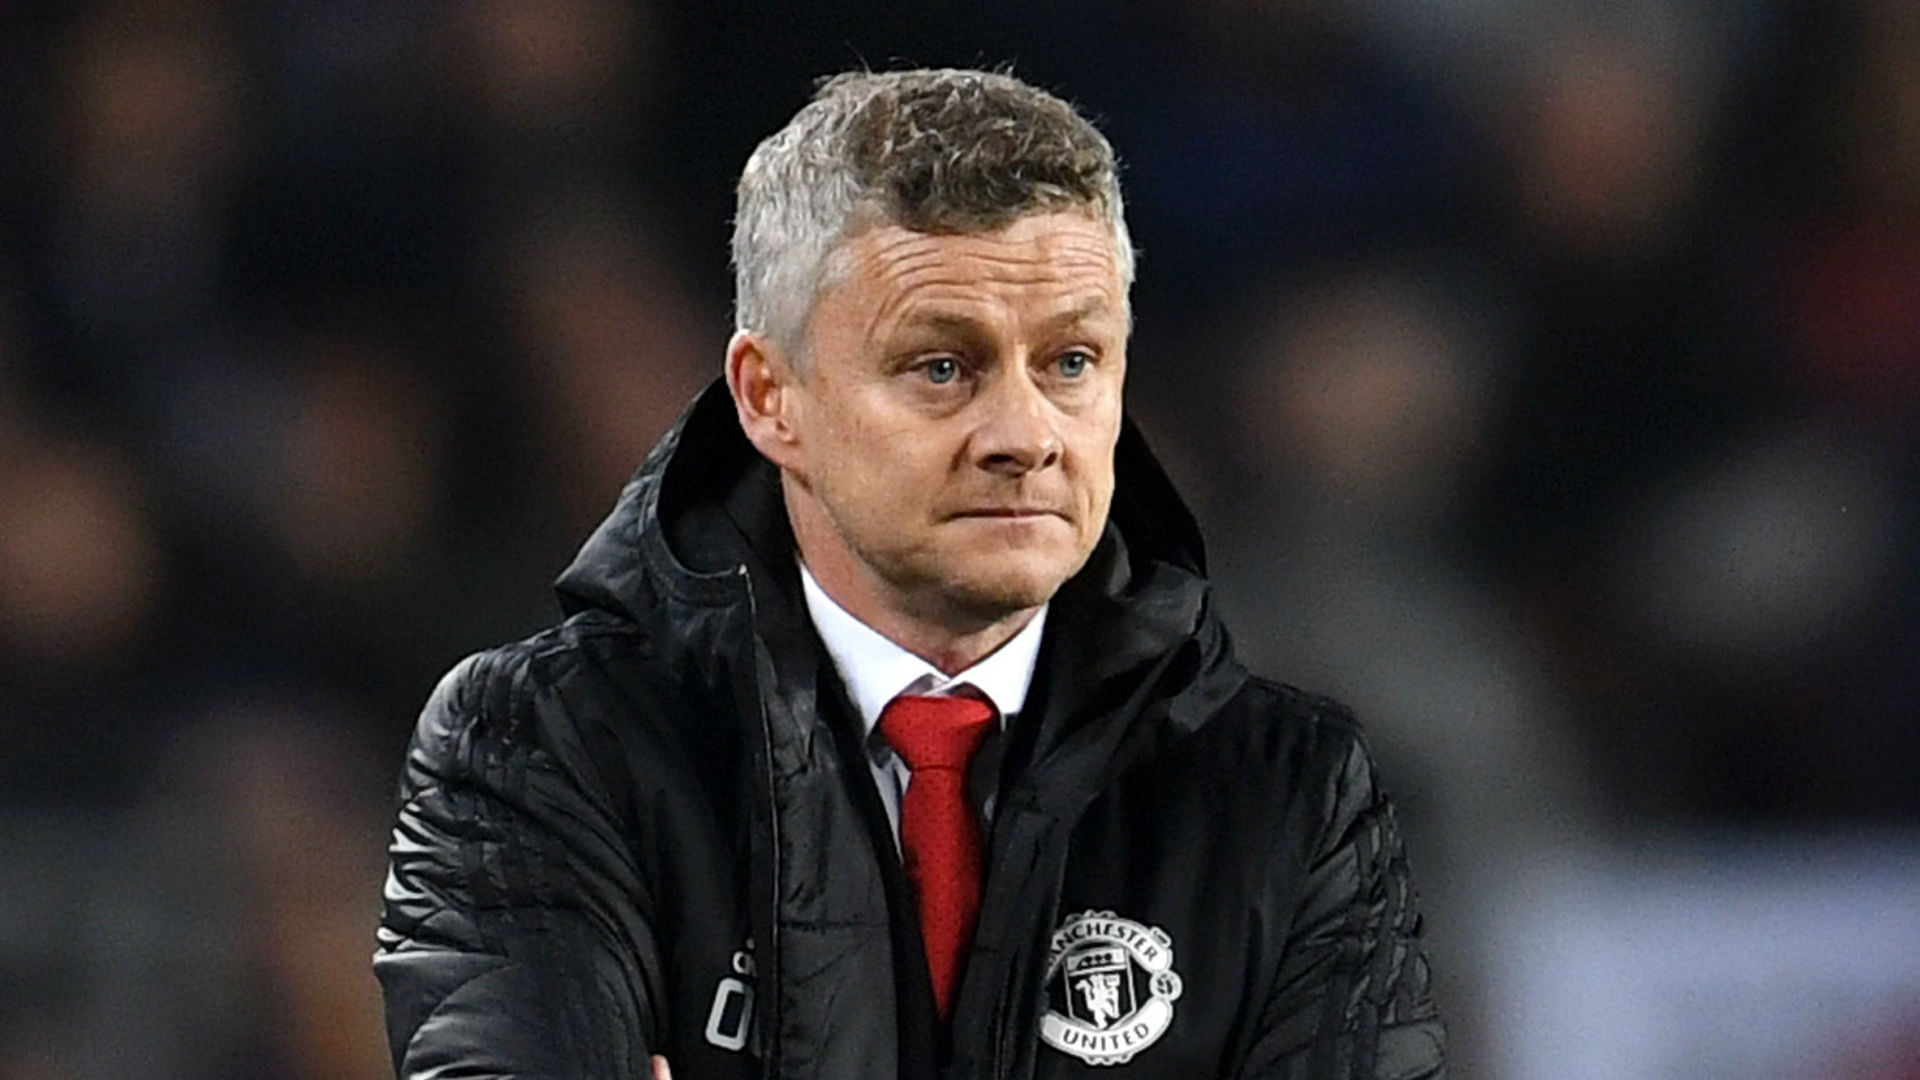 ole gunnar solskjaer cropped a8jd73az6yfy12tj9ry1gu73b - EPL: Solskjaer warned about Man Utd's possible relegation